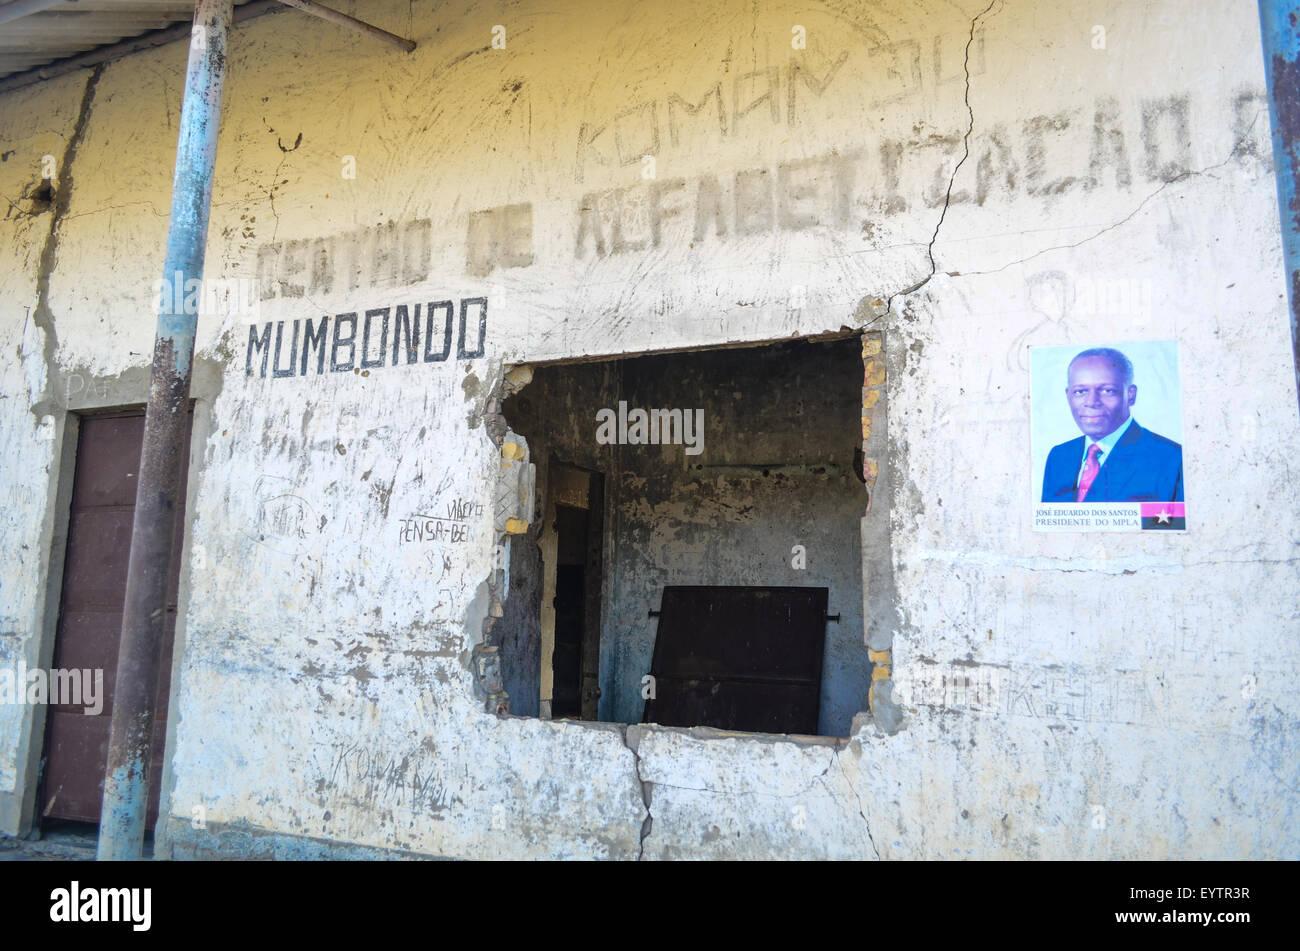 Ruins of a center of alphabetization in rural Angola near Mumbondo - Stock Image